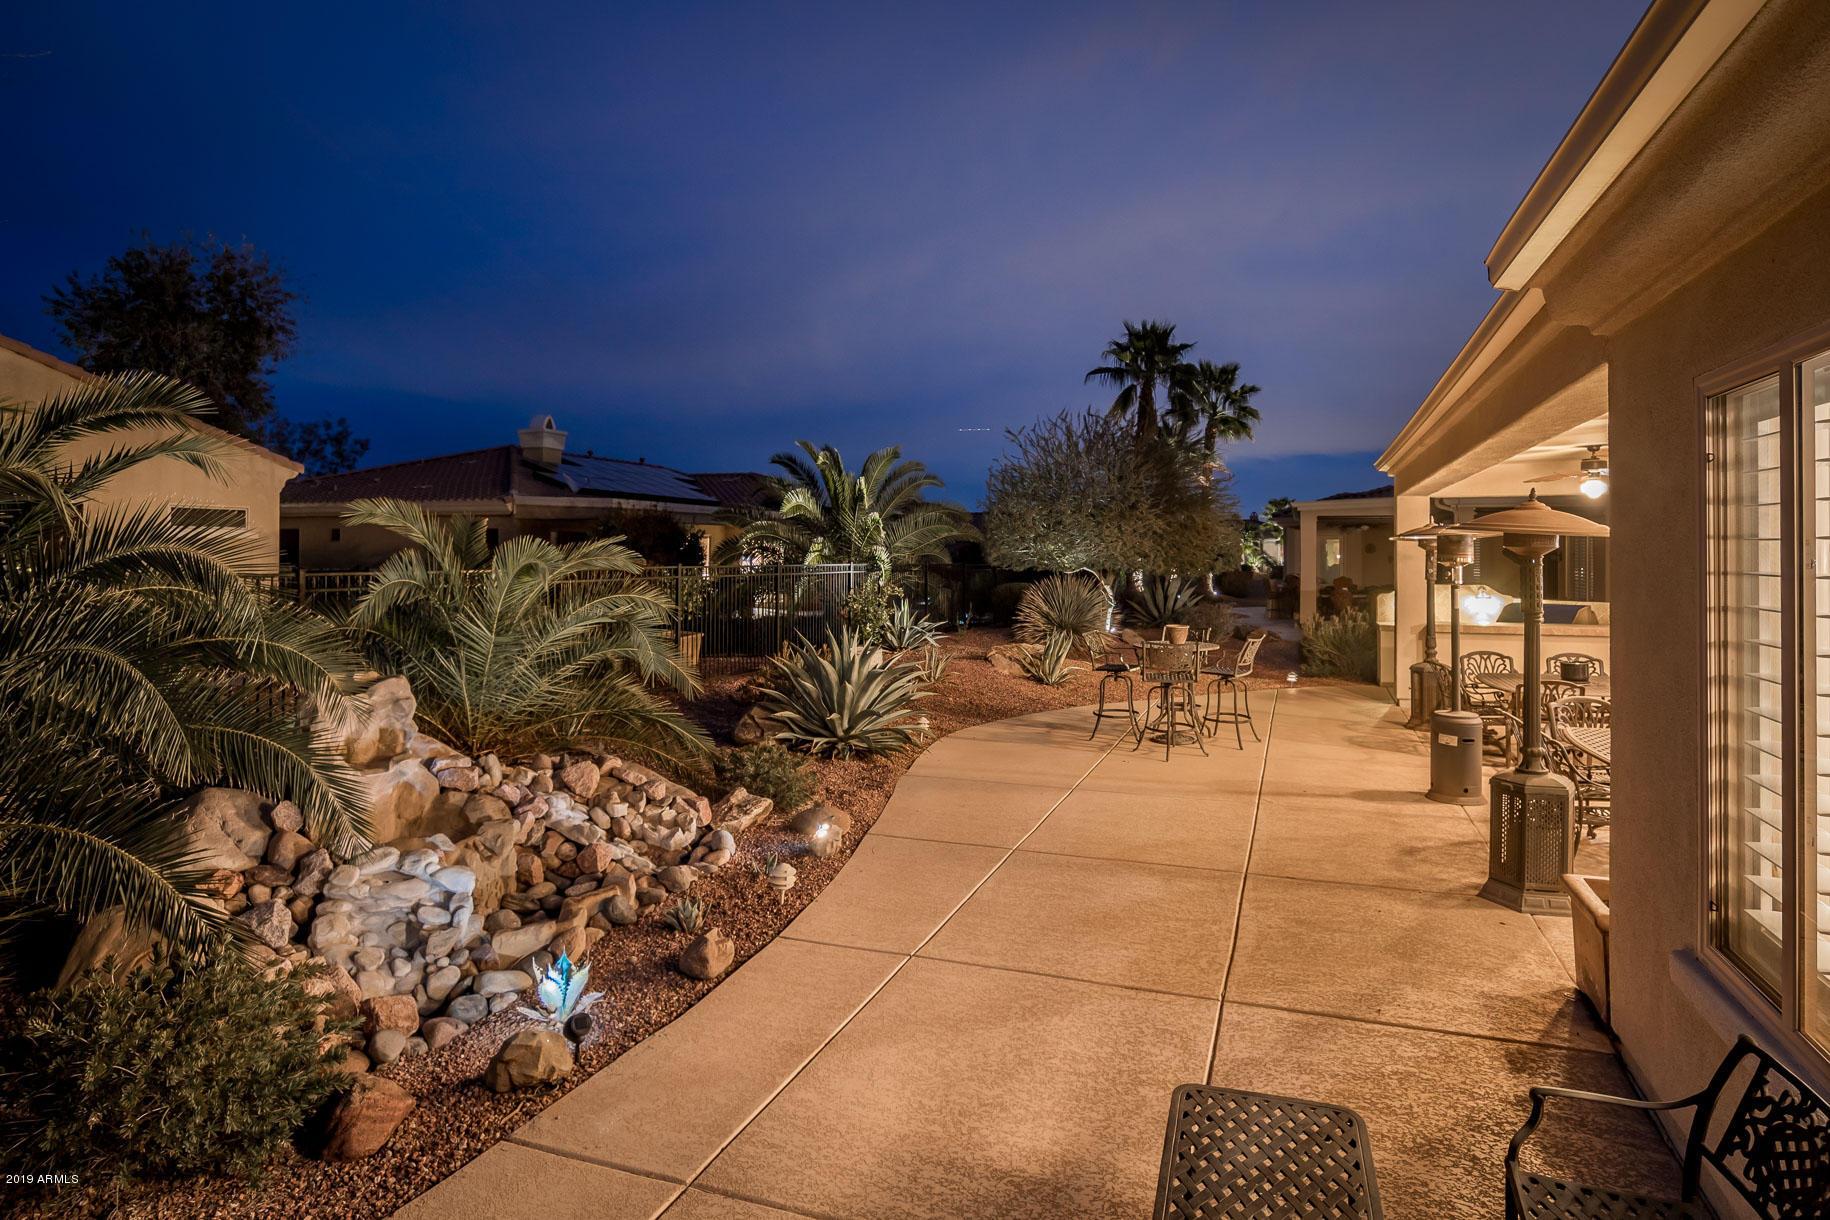 MLS 5888802 13118 W MICHELTORENA Drive, Sun City West, AZ 85375 Sun City West AZ Luxury